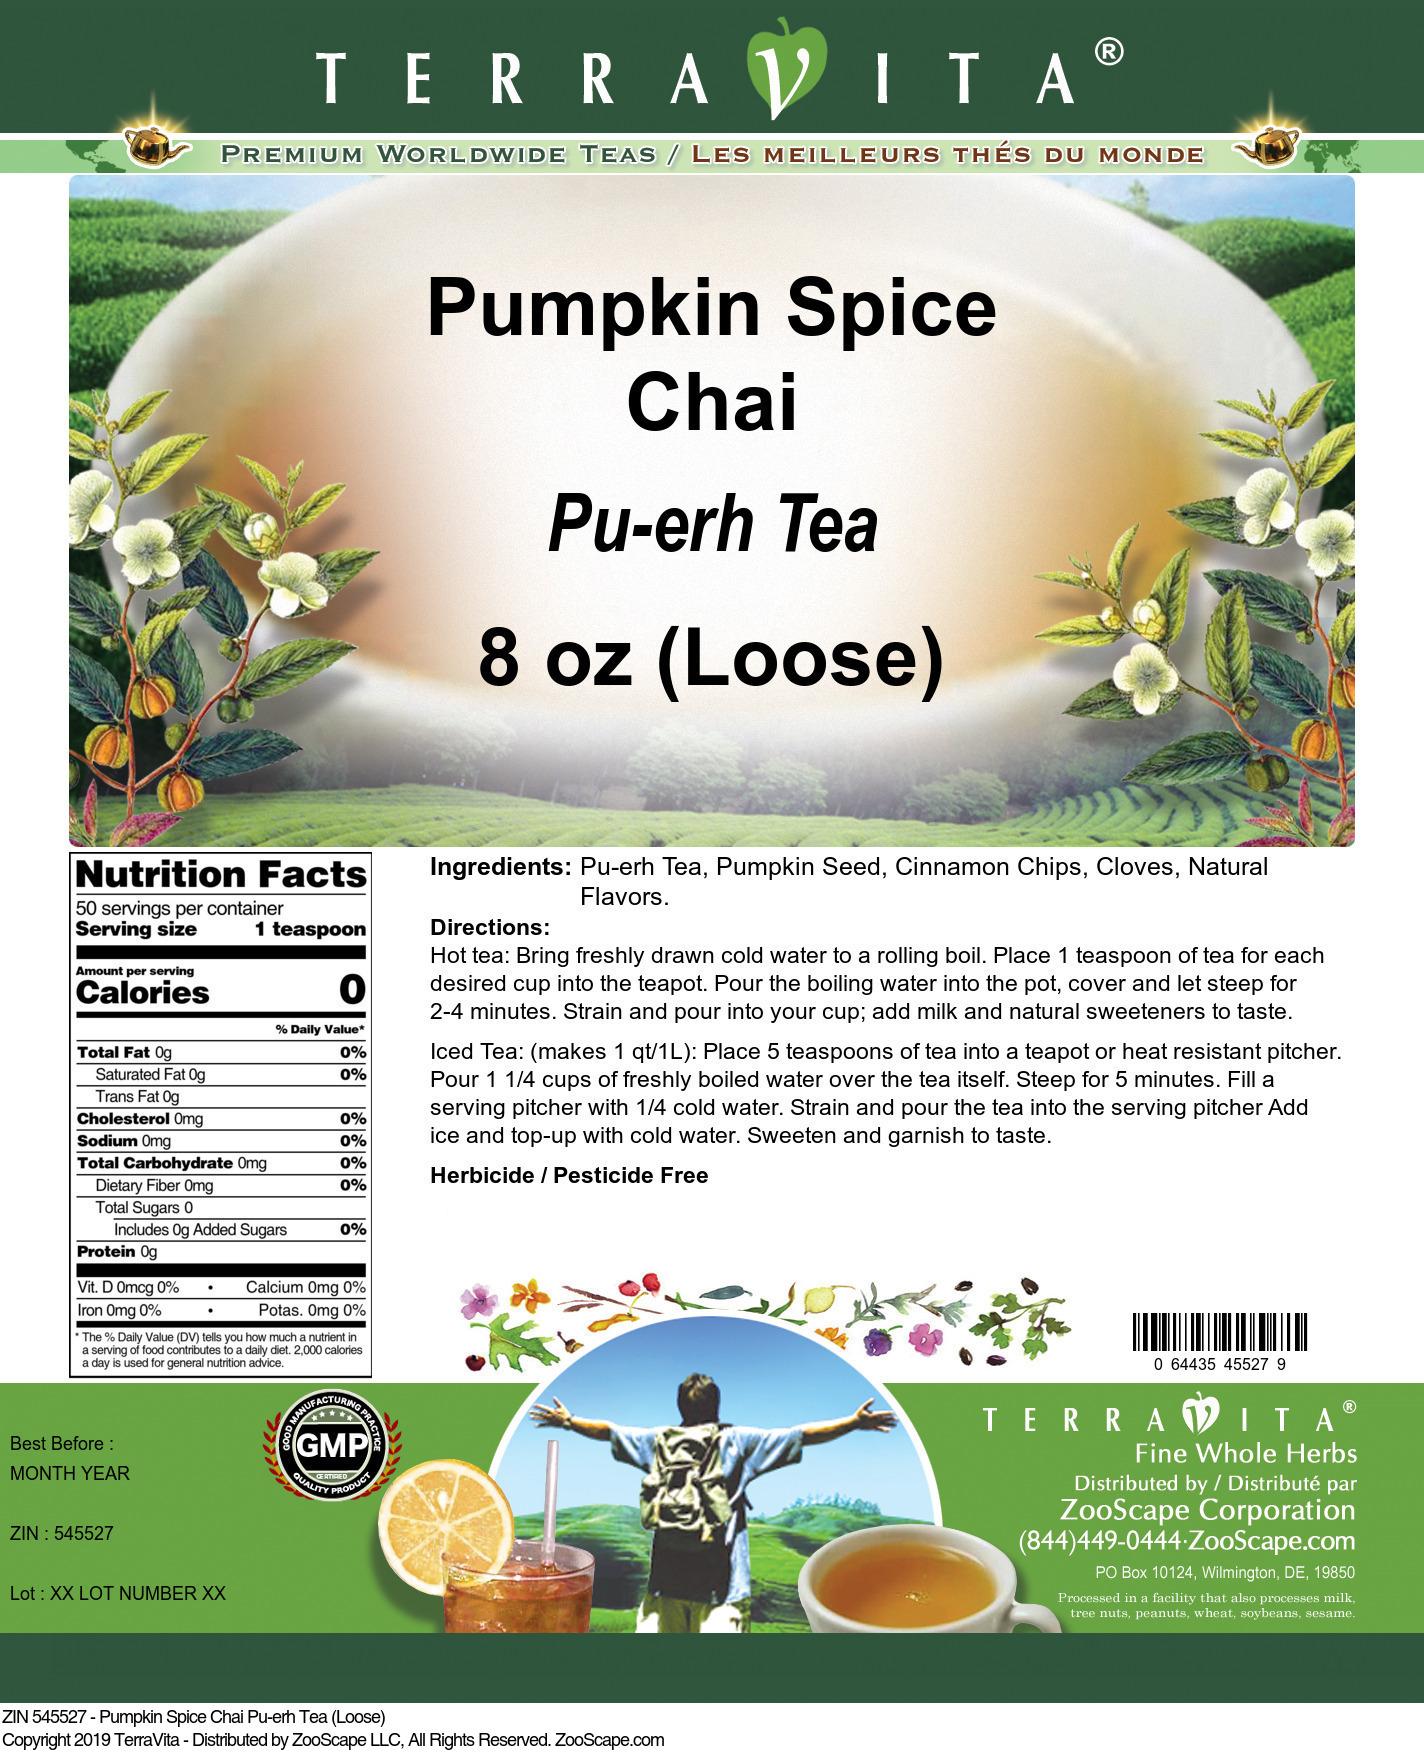 Pumpkin Spice Chai Pu-erh Tea (Loose)